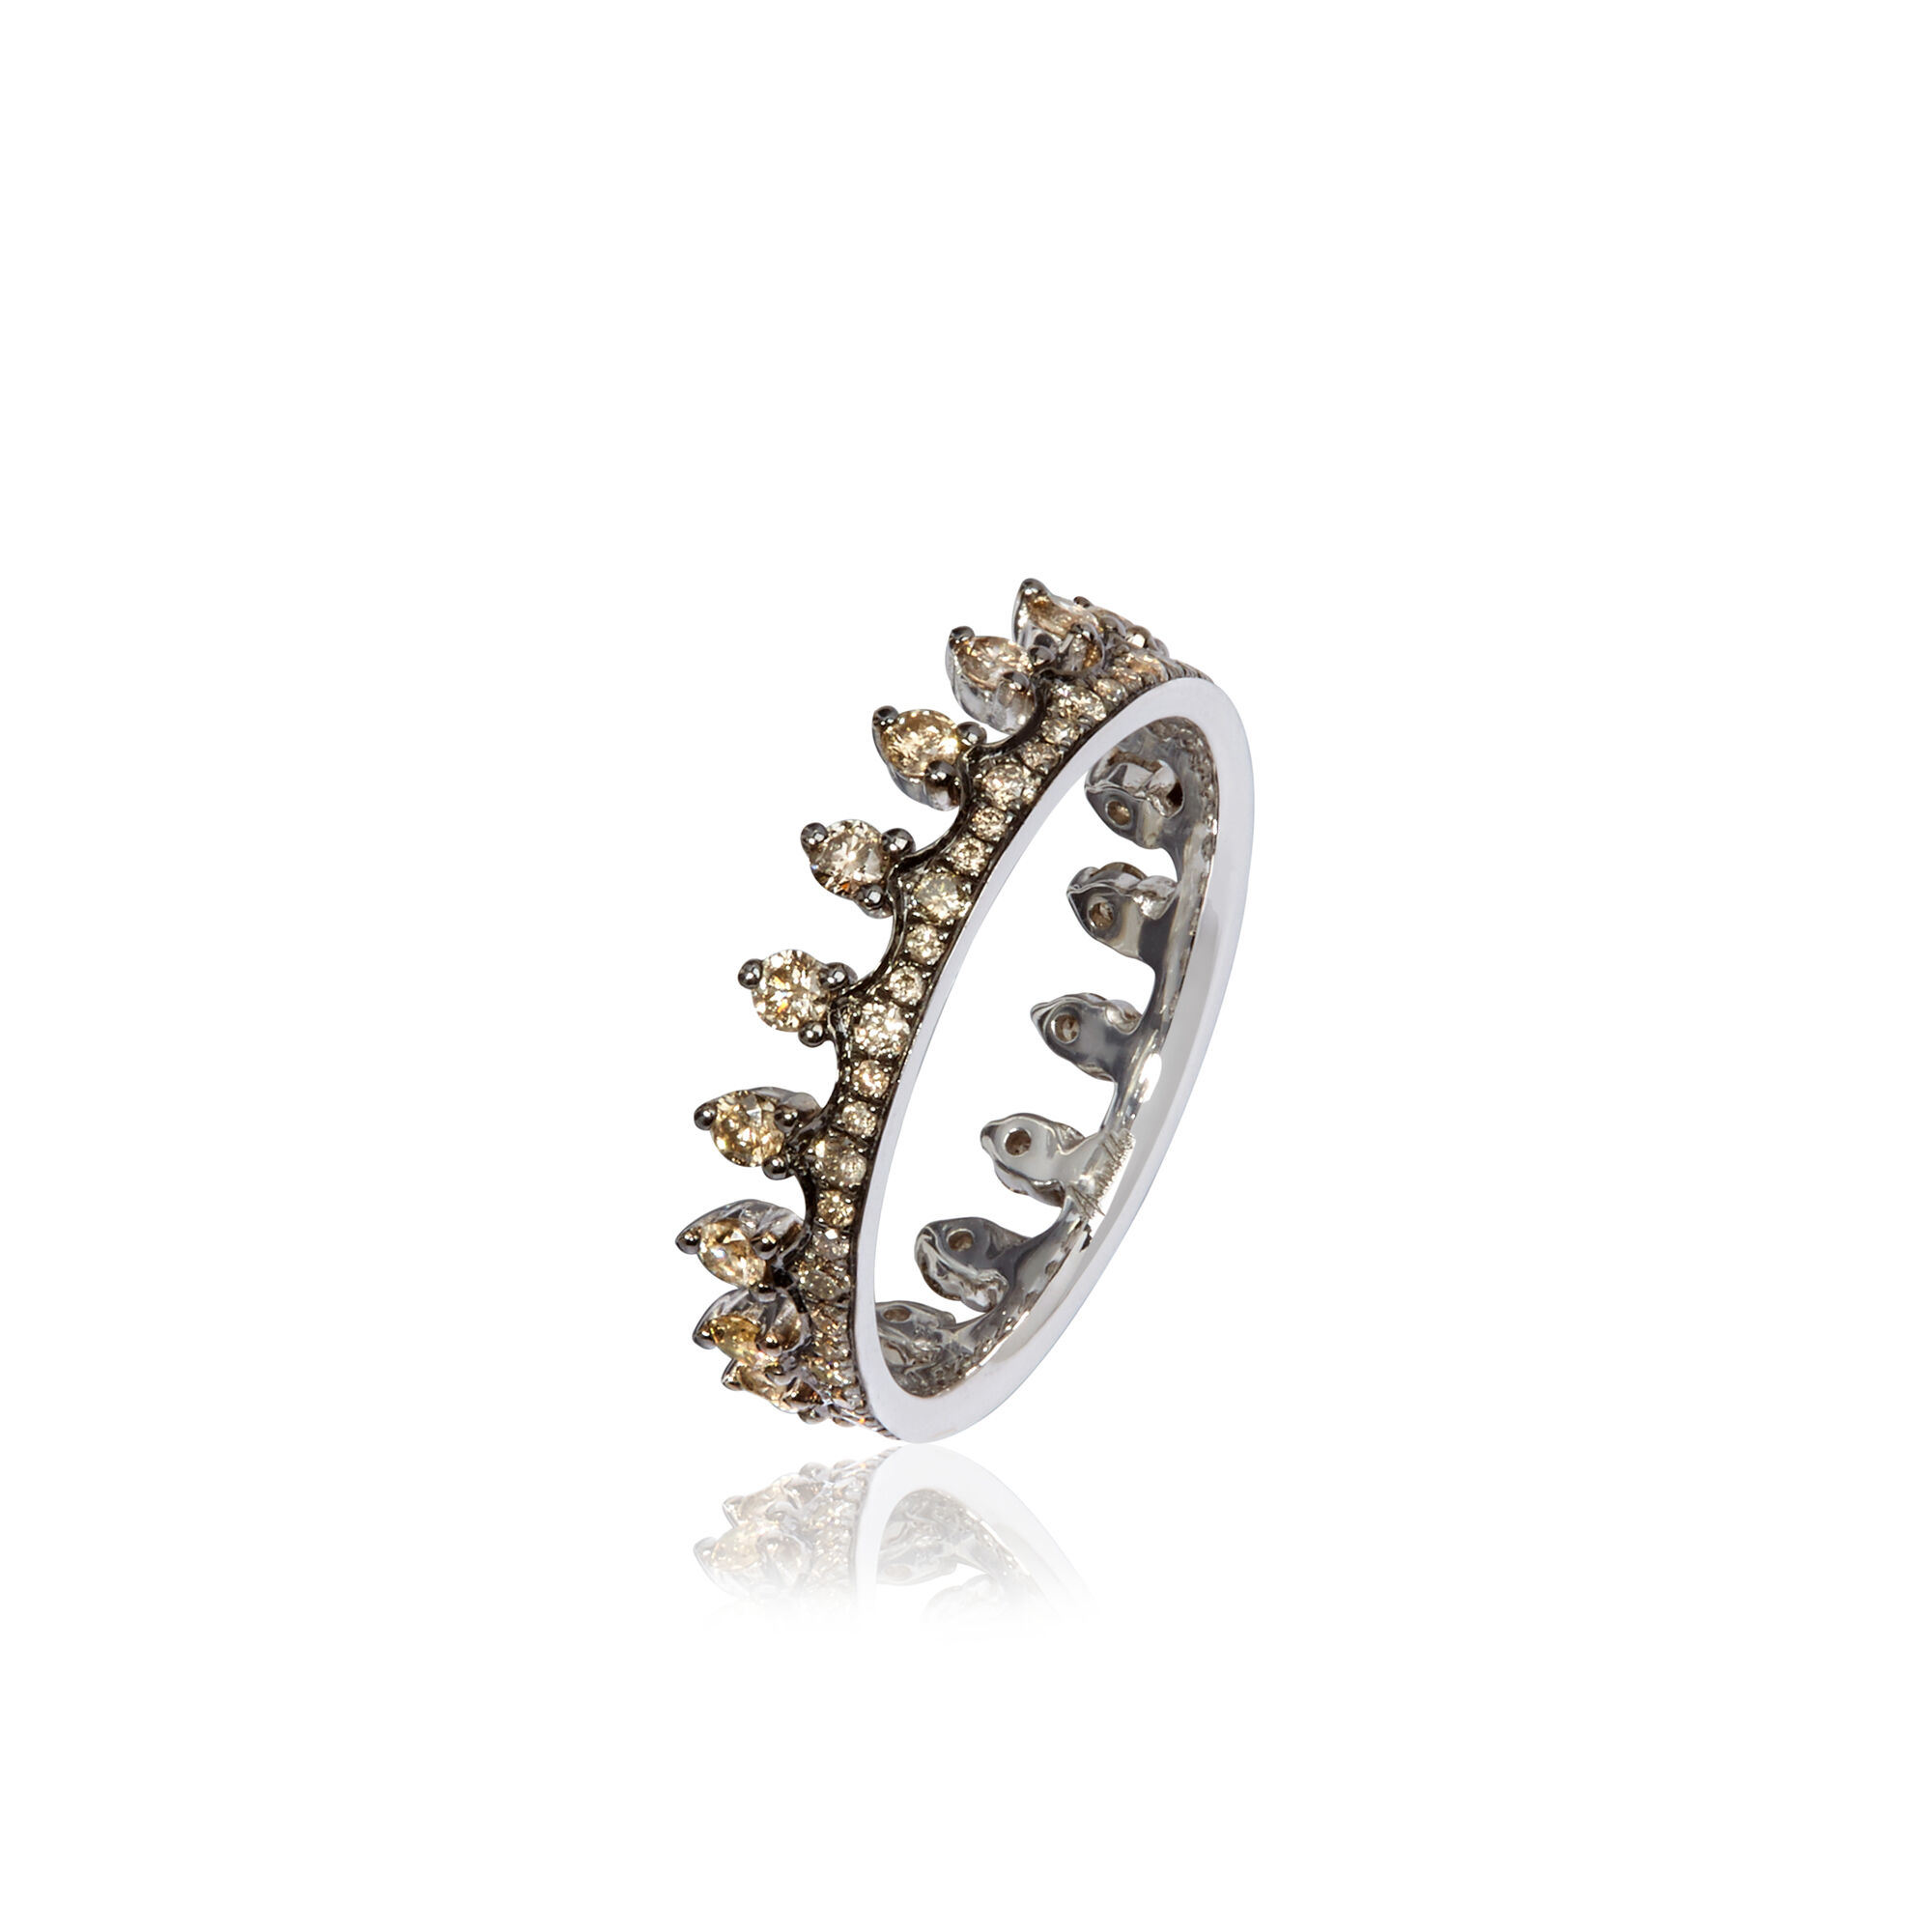 Crown 18ct White Gold Diamond Ring — Annoushka US